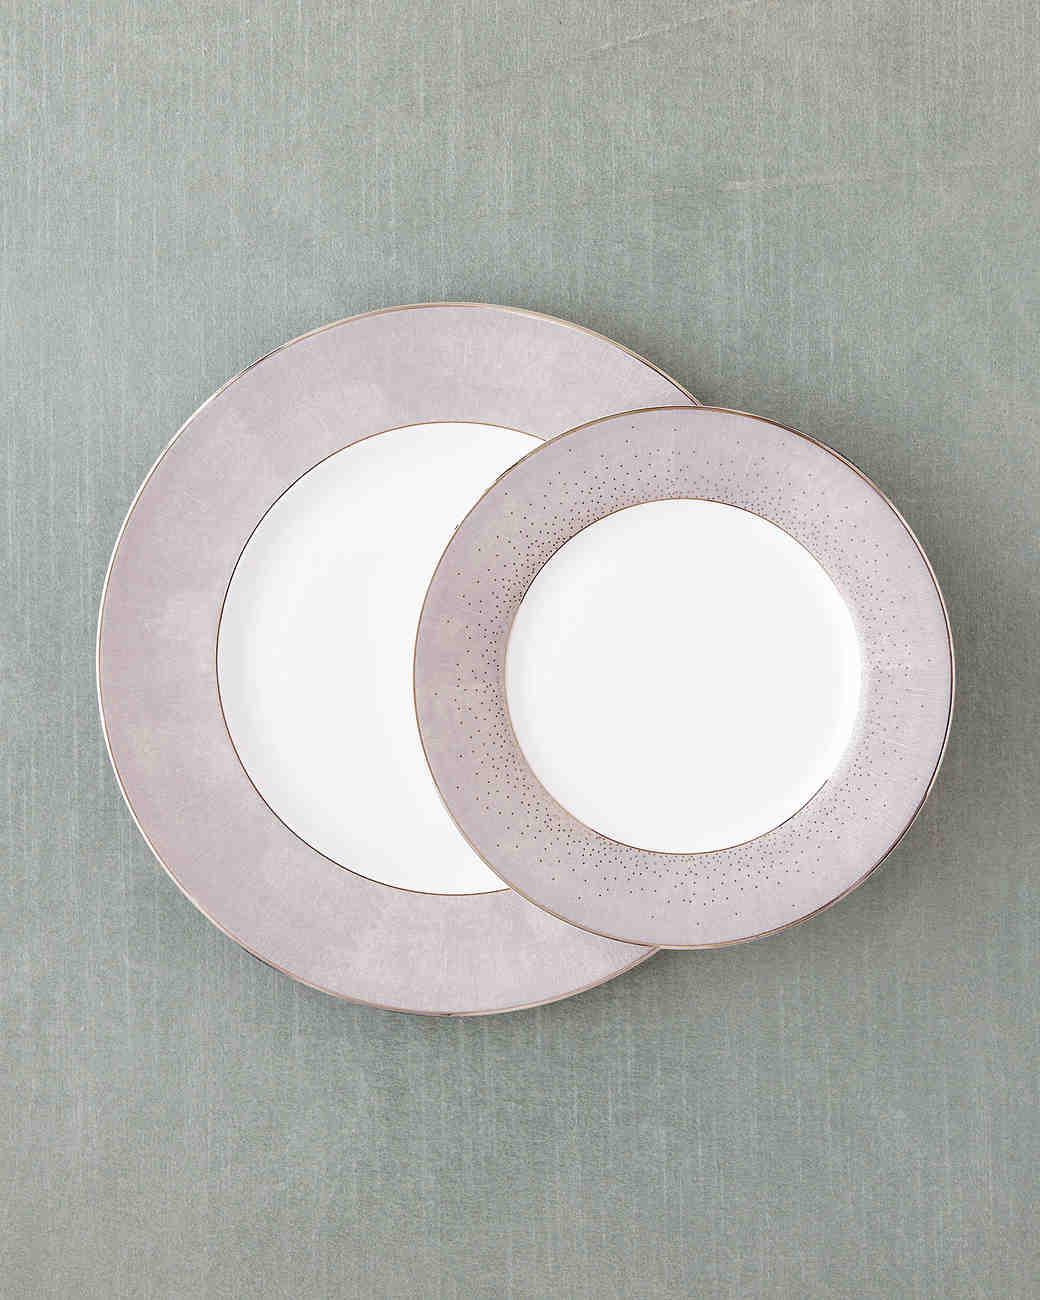 dinnerware-1-0811mwd107434.jpg